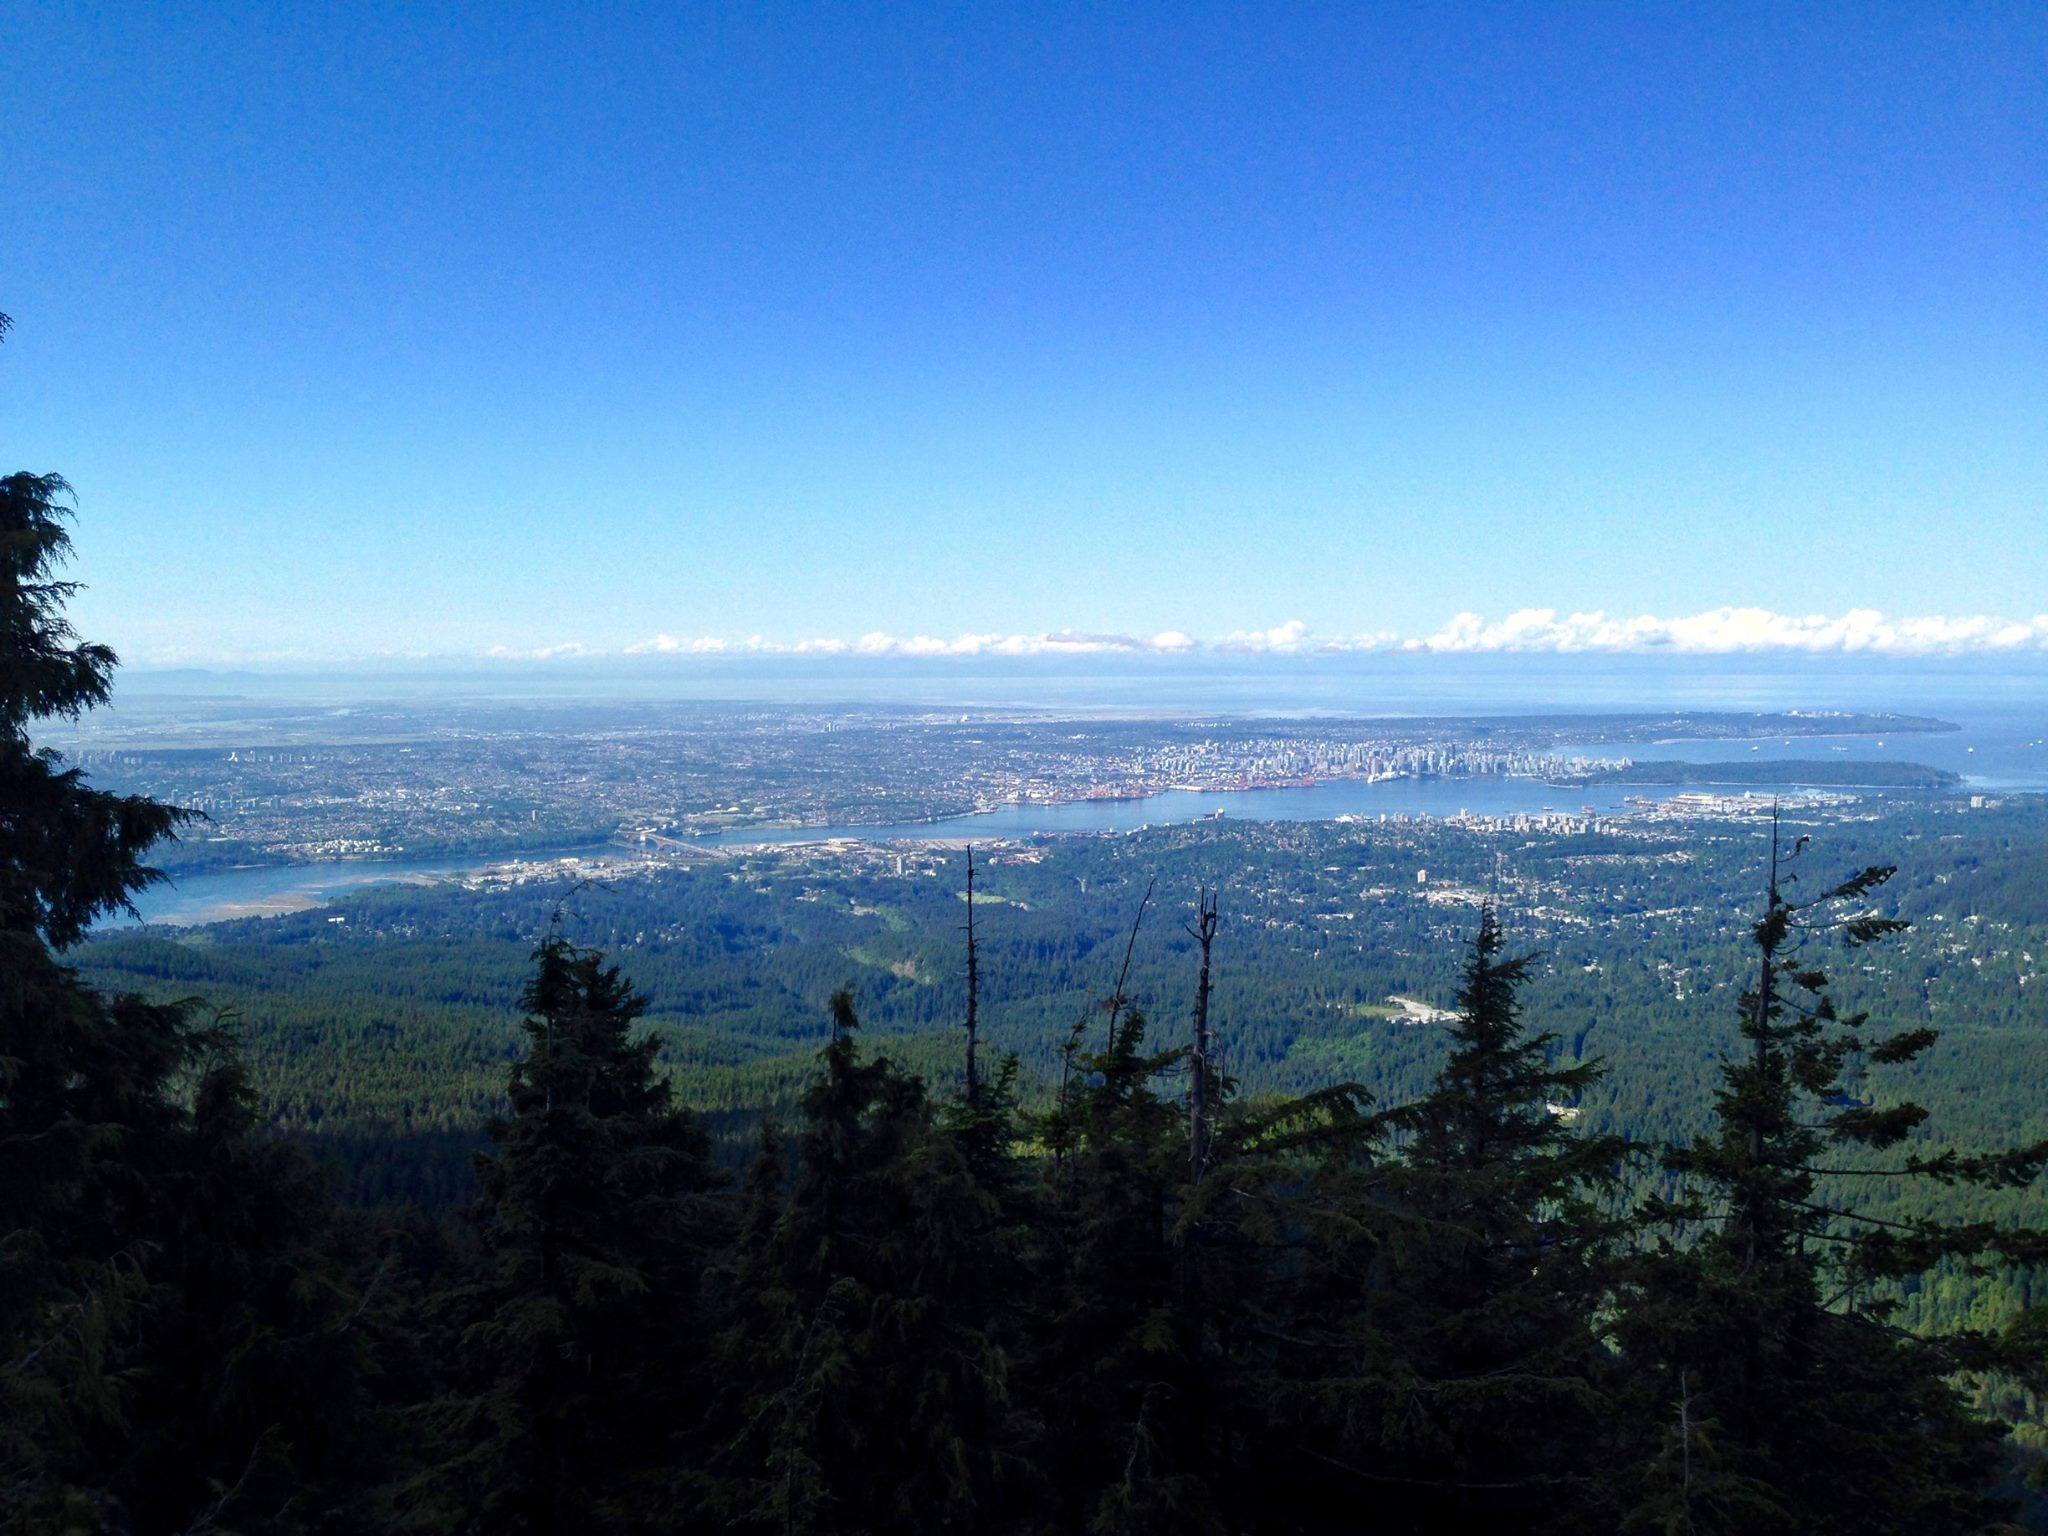 Hike to Mt. Seymour, Fall 2016